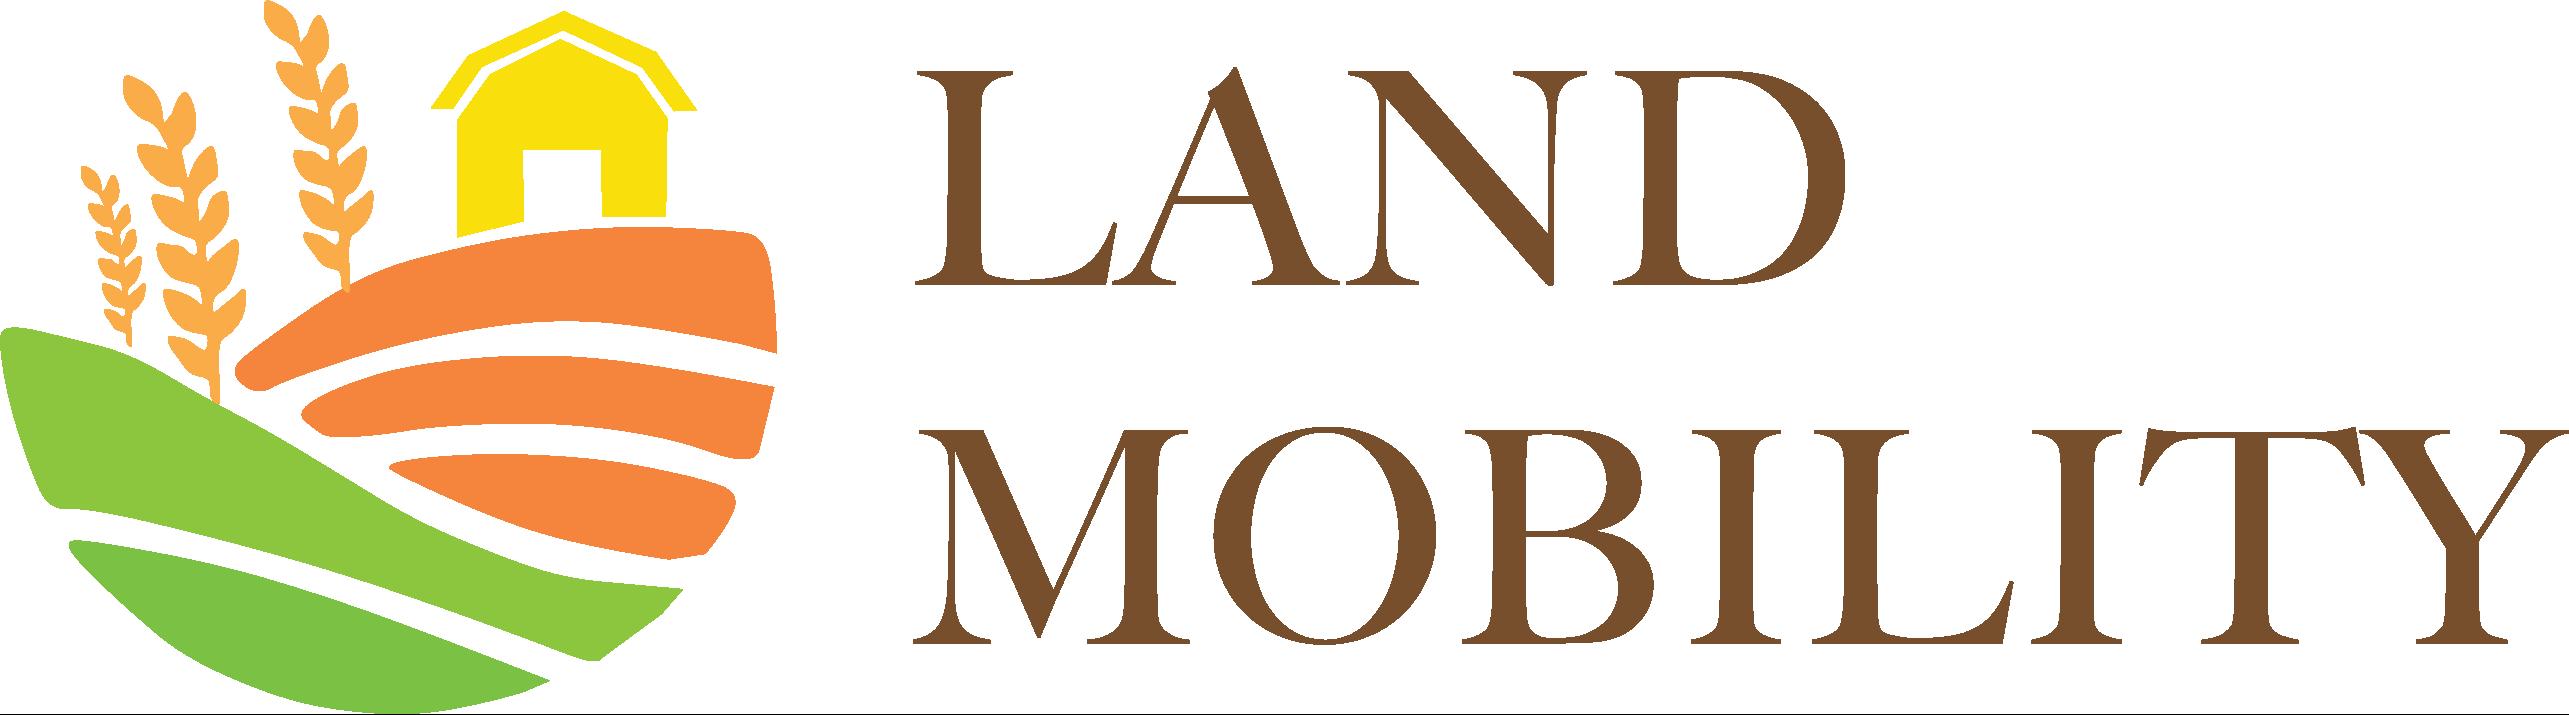 LandMobility